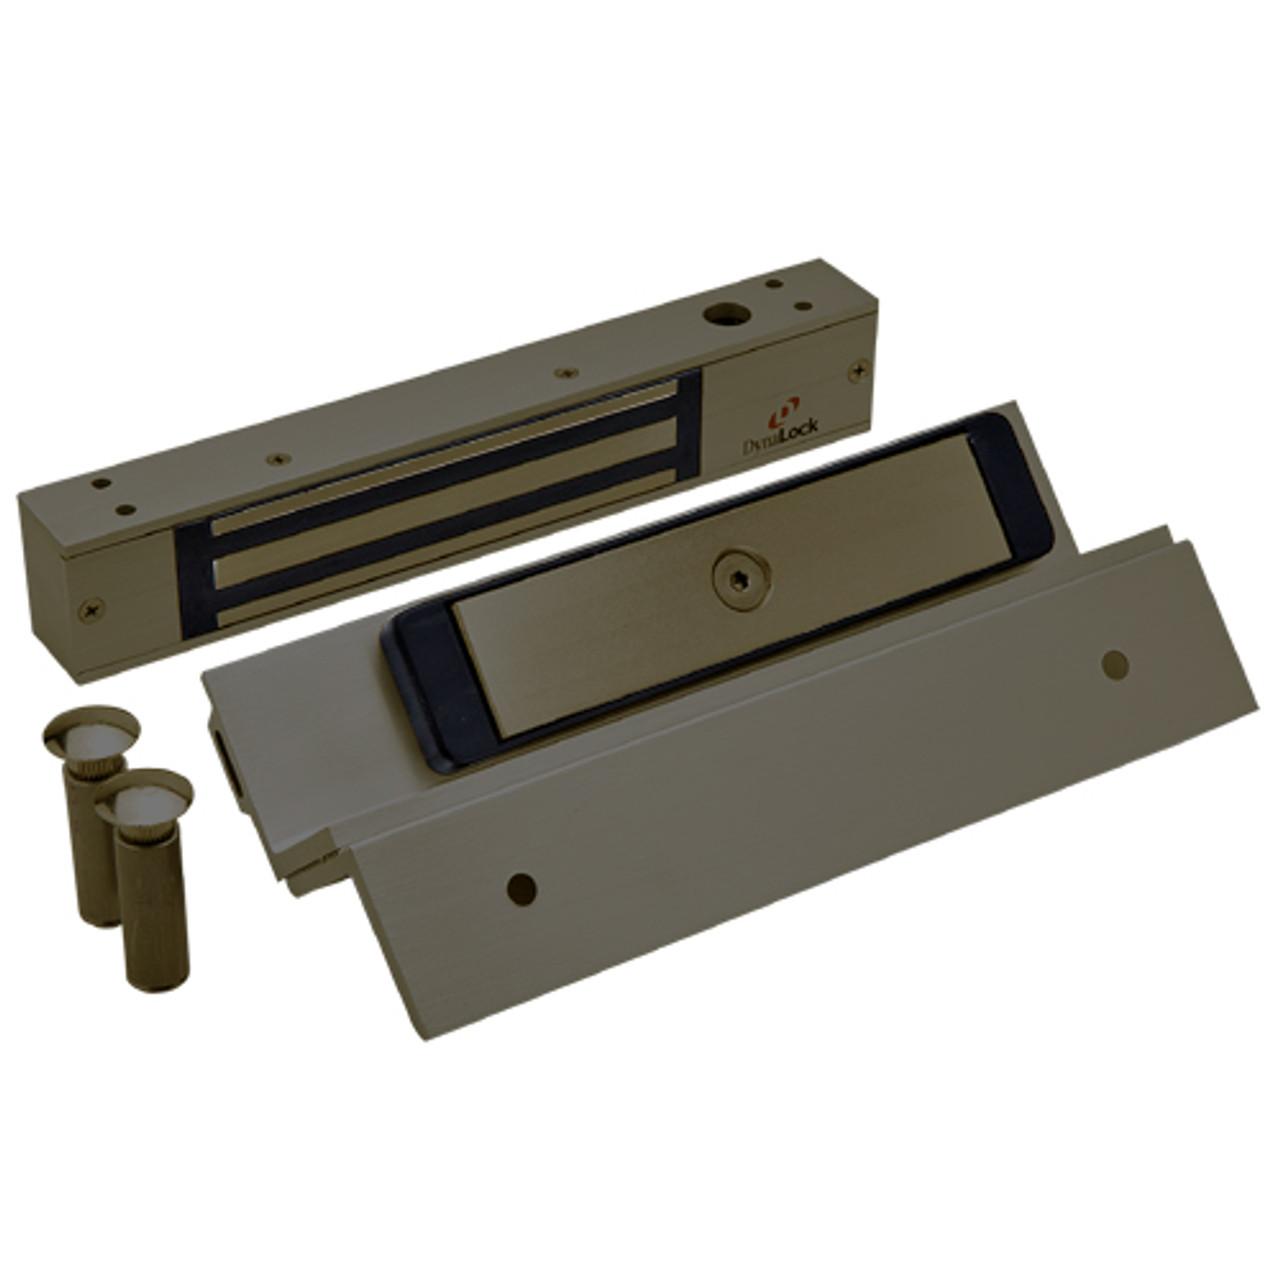 2511TJ-US10B DynaLock 2500 Series 650 LB Mini-Mag Single Electromagnetic Lock for Inswing Door in Oil Rubbed Bronze